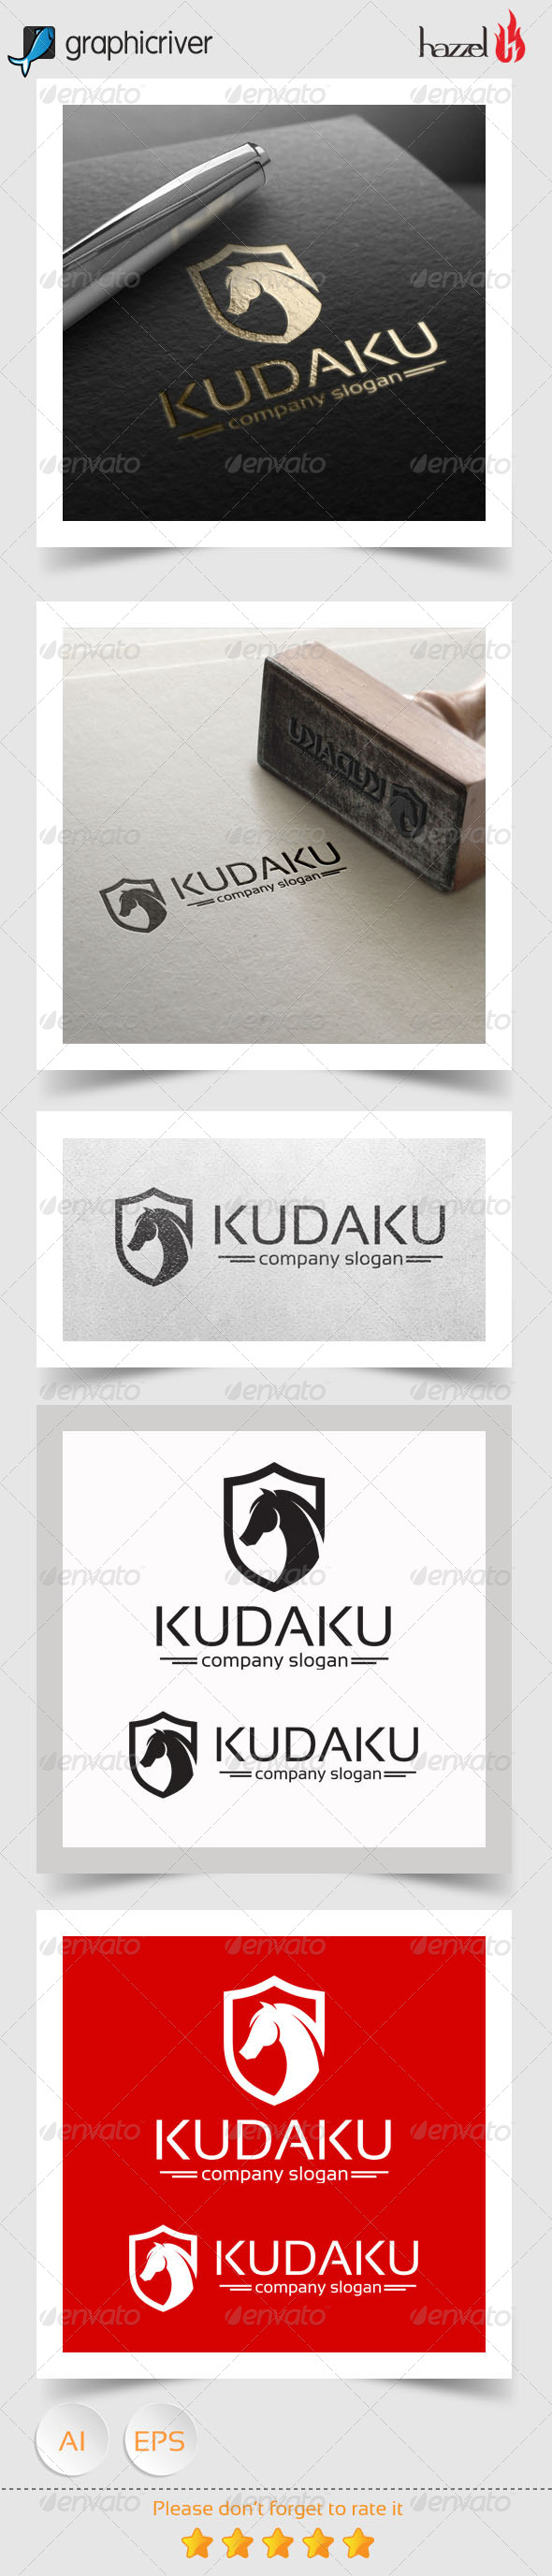 GraphicRiver Kudaku Logo 8138925